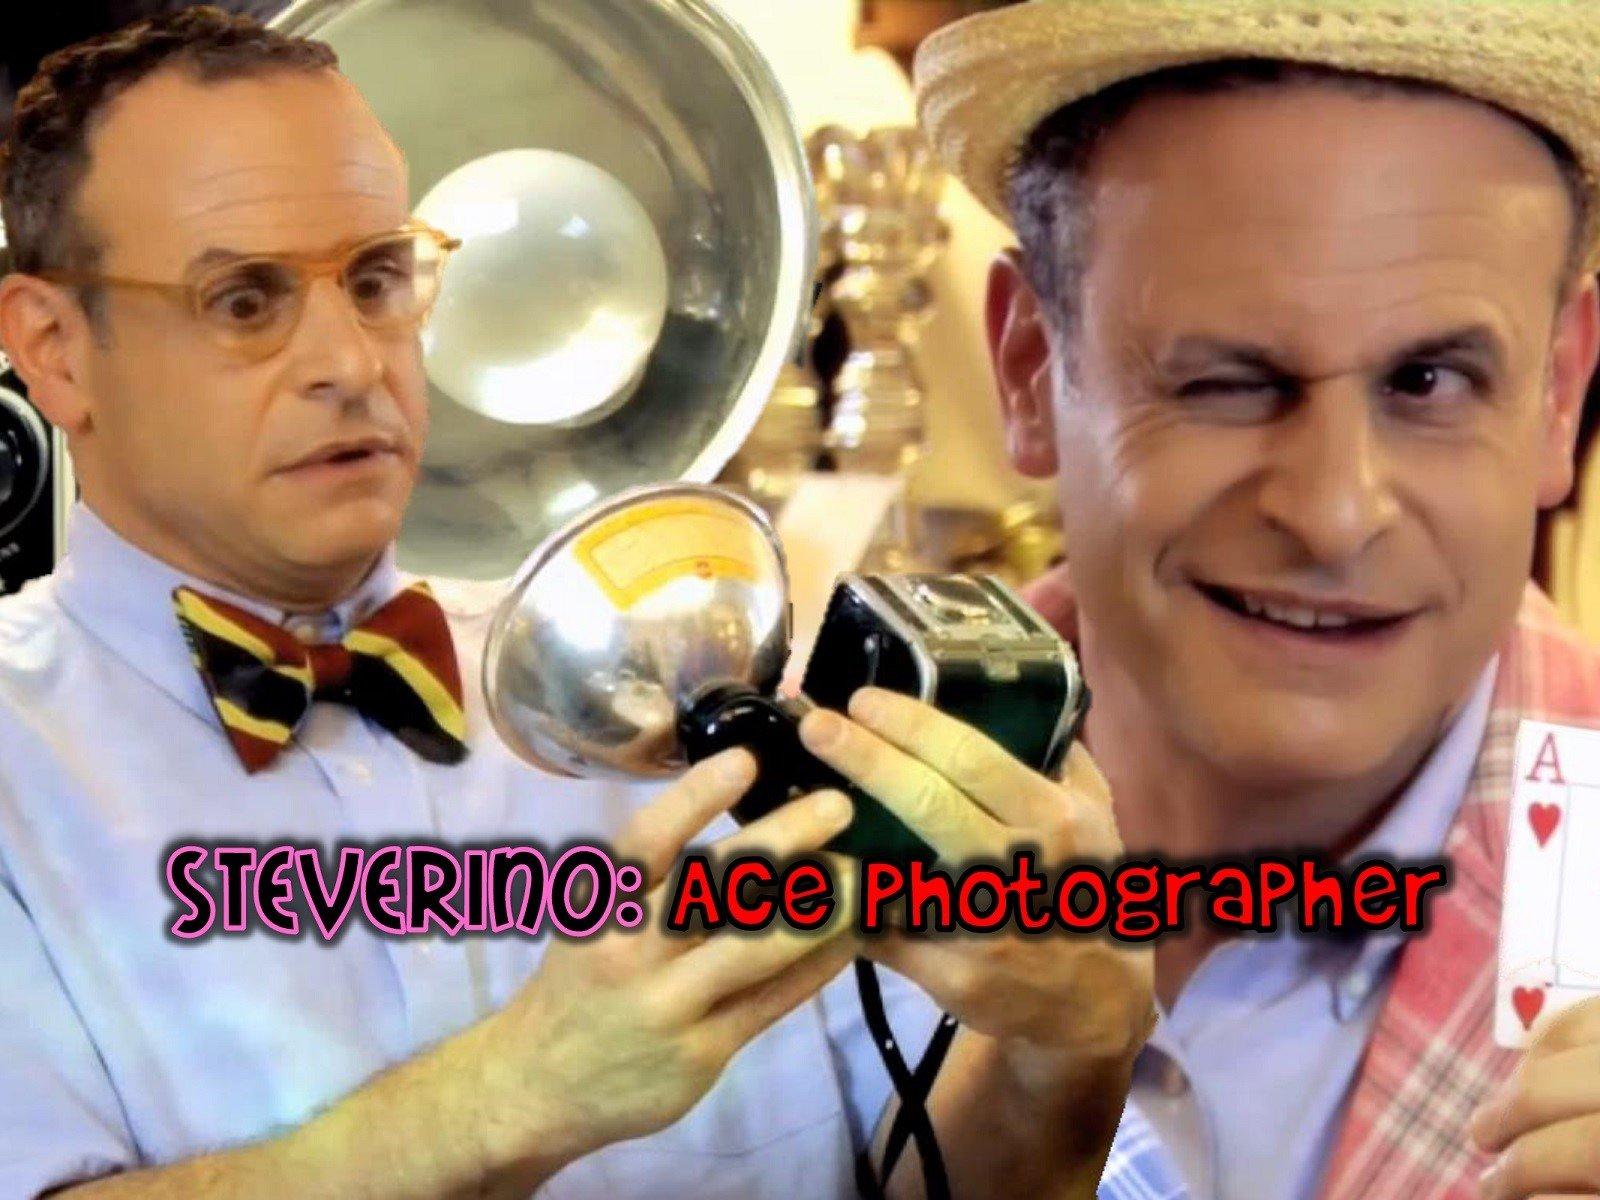 Steverino: Ace Photographer on Amazon Prime Instant Video UK